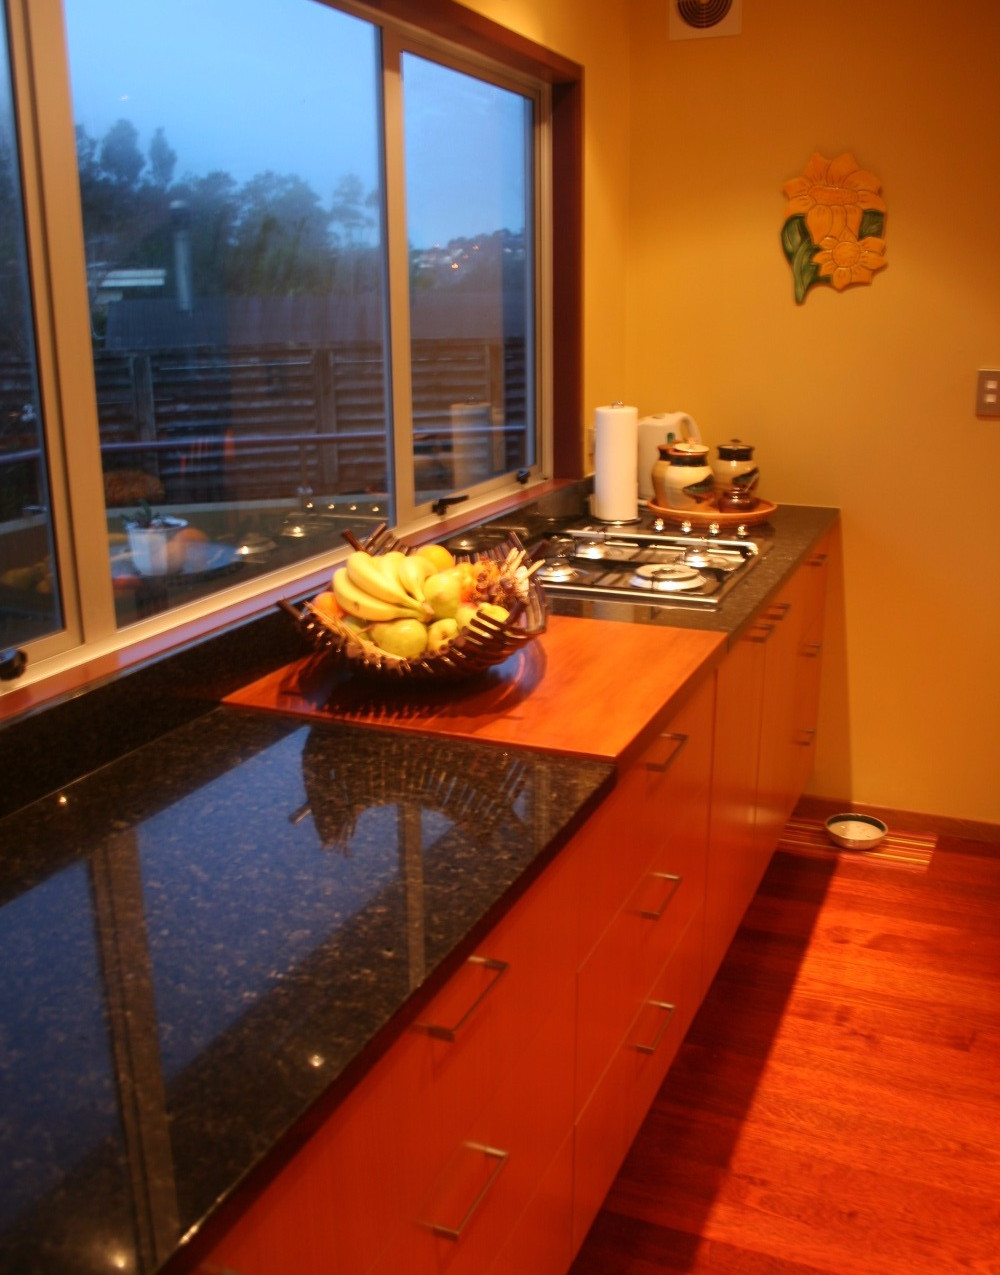 BeachHaven Kitchen Renovation After